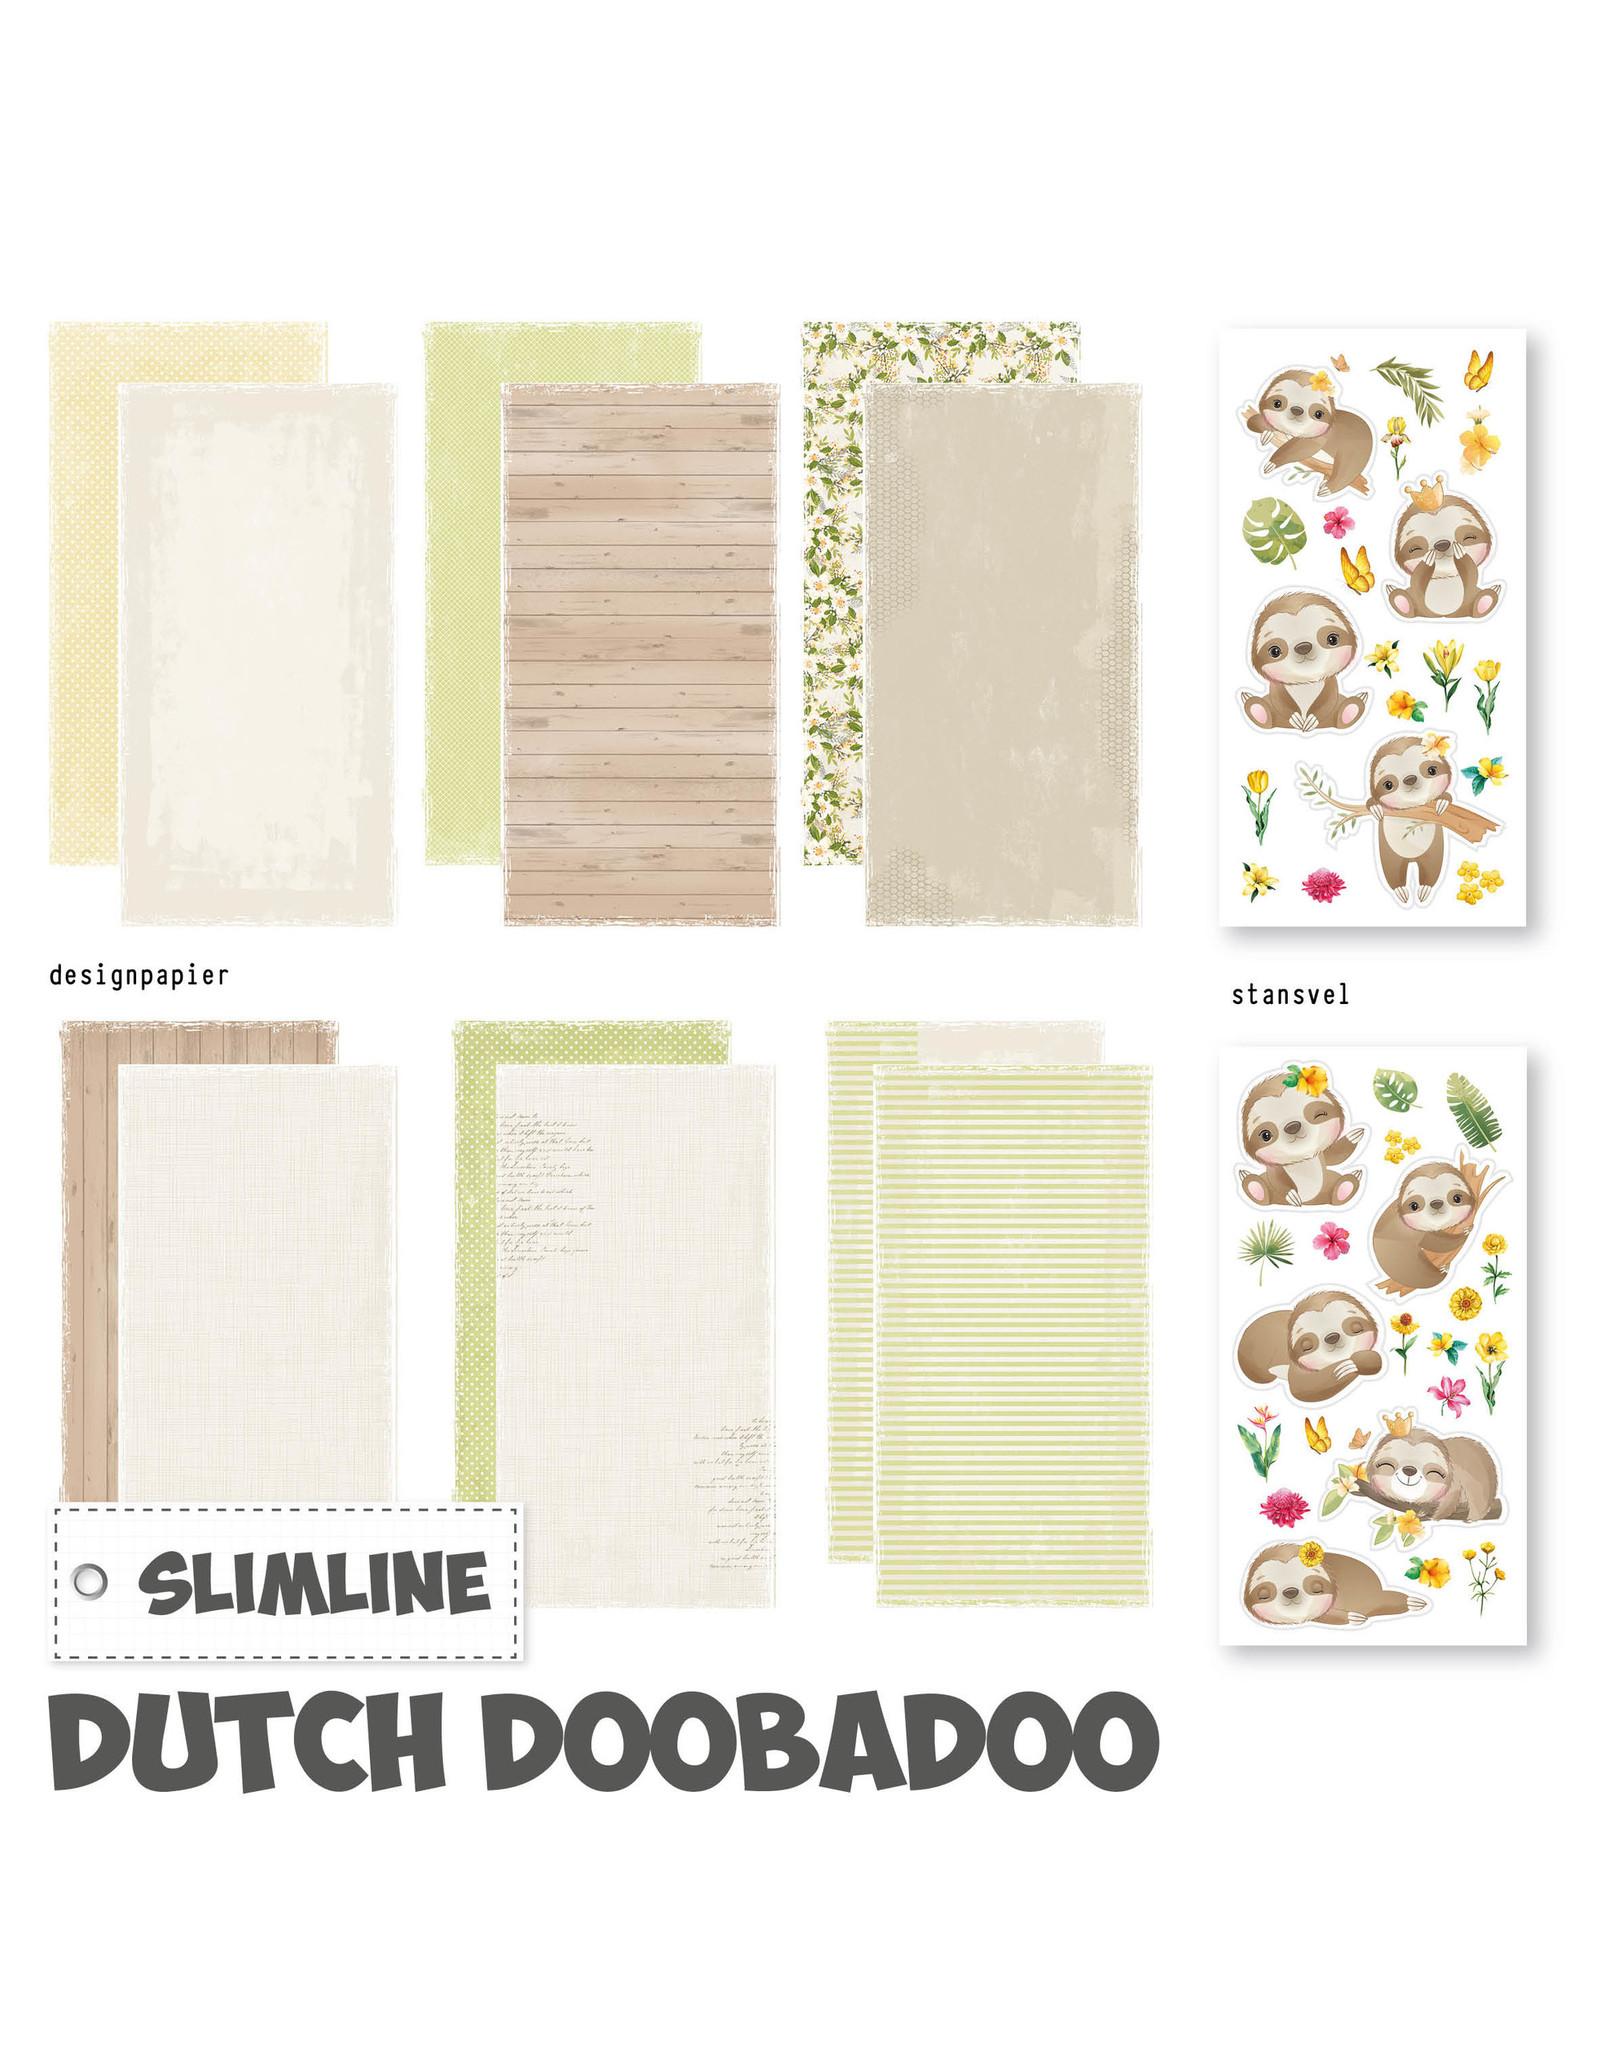 Dutch Doobadoo DDBD Slimline paper Kit Luiaard